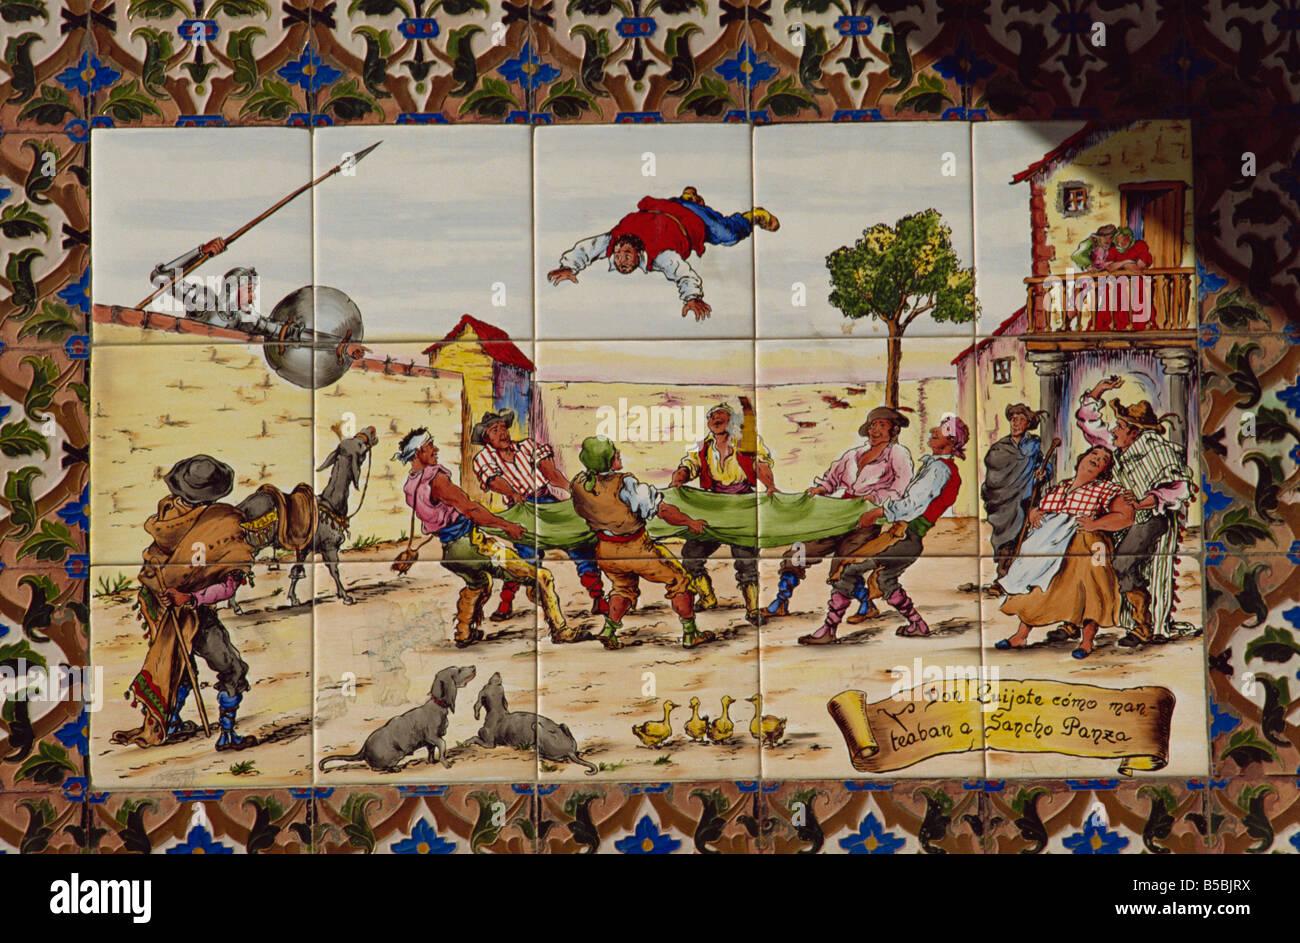 Painted wall tiles of Don Quixote, Toledo, Castilla La Mancha, Spain, Europe - Stock Image